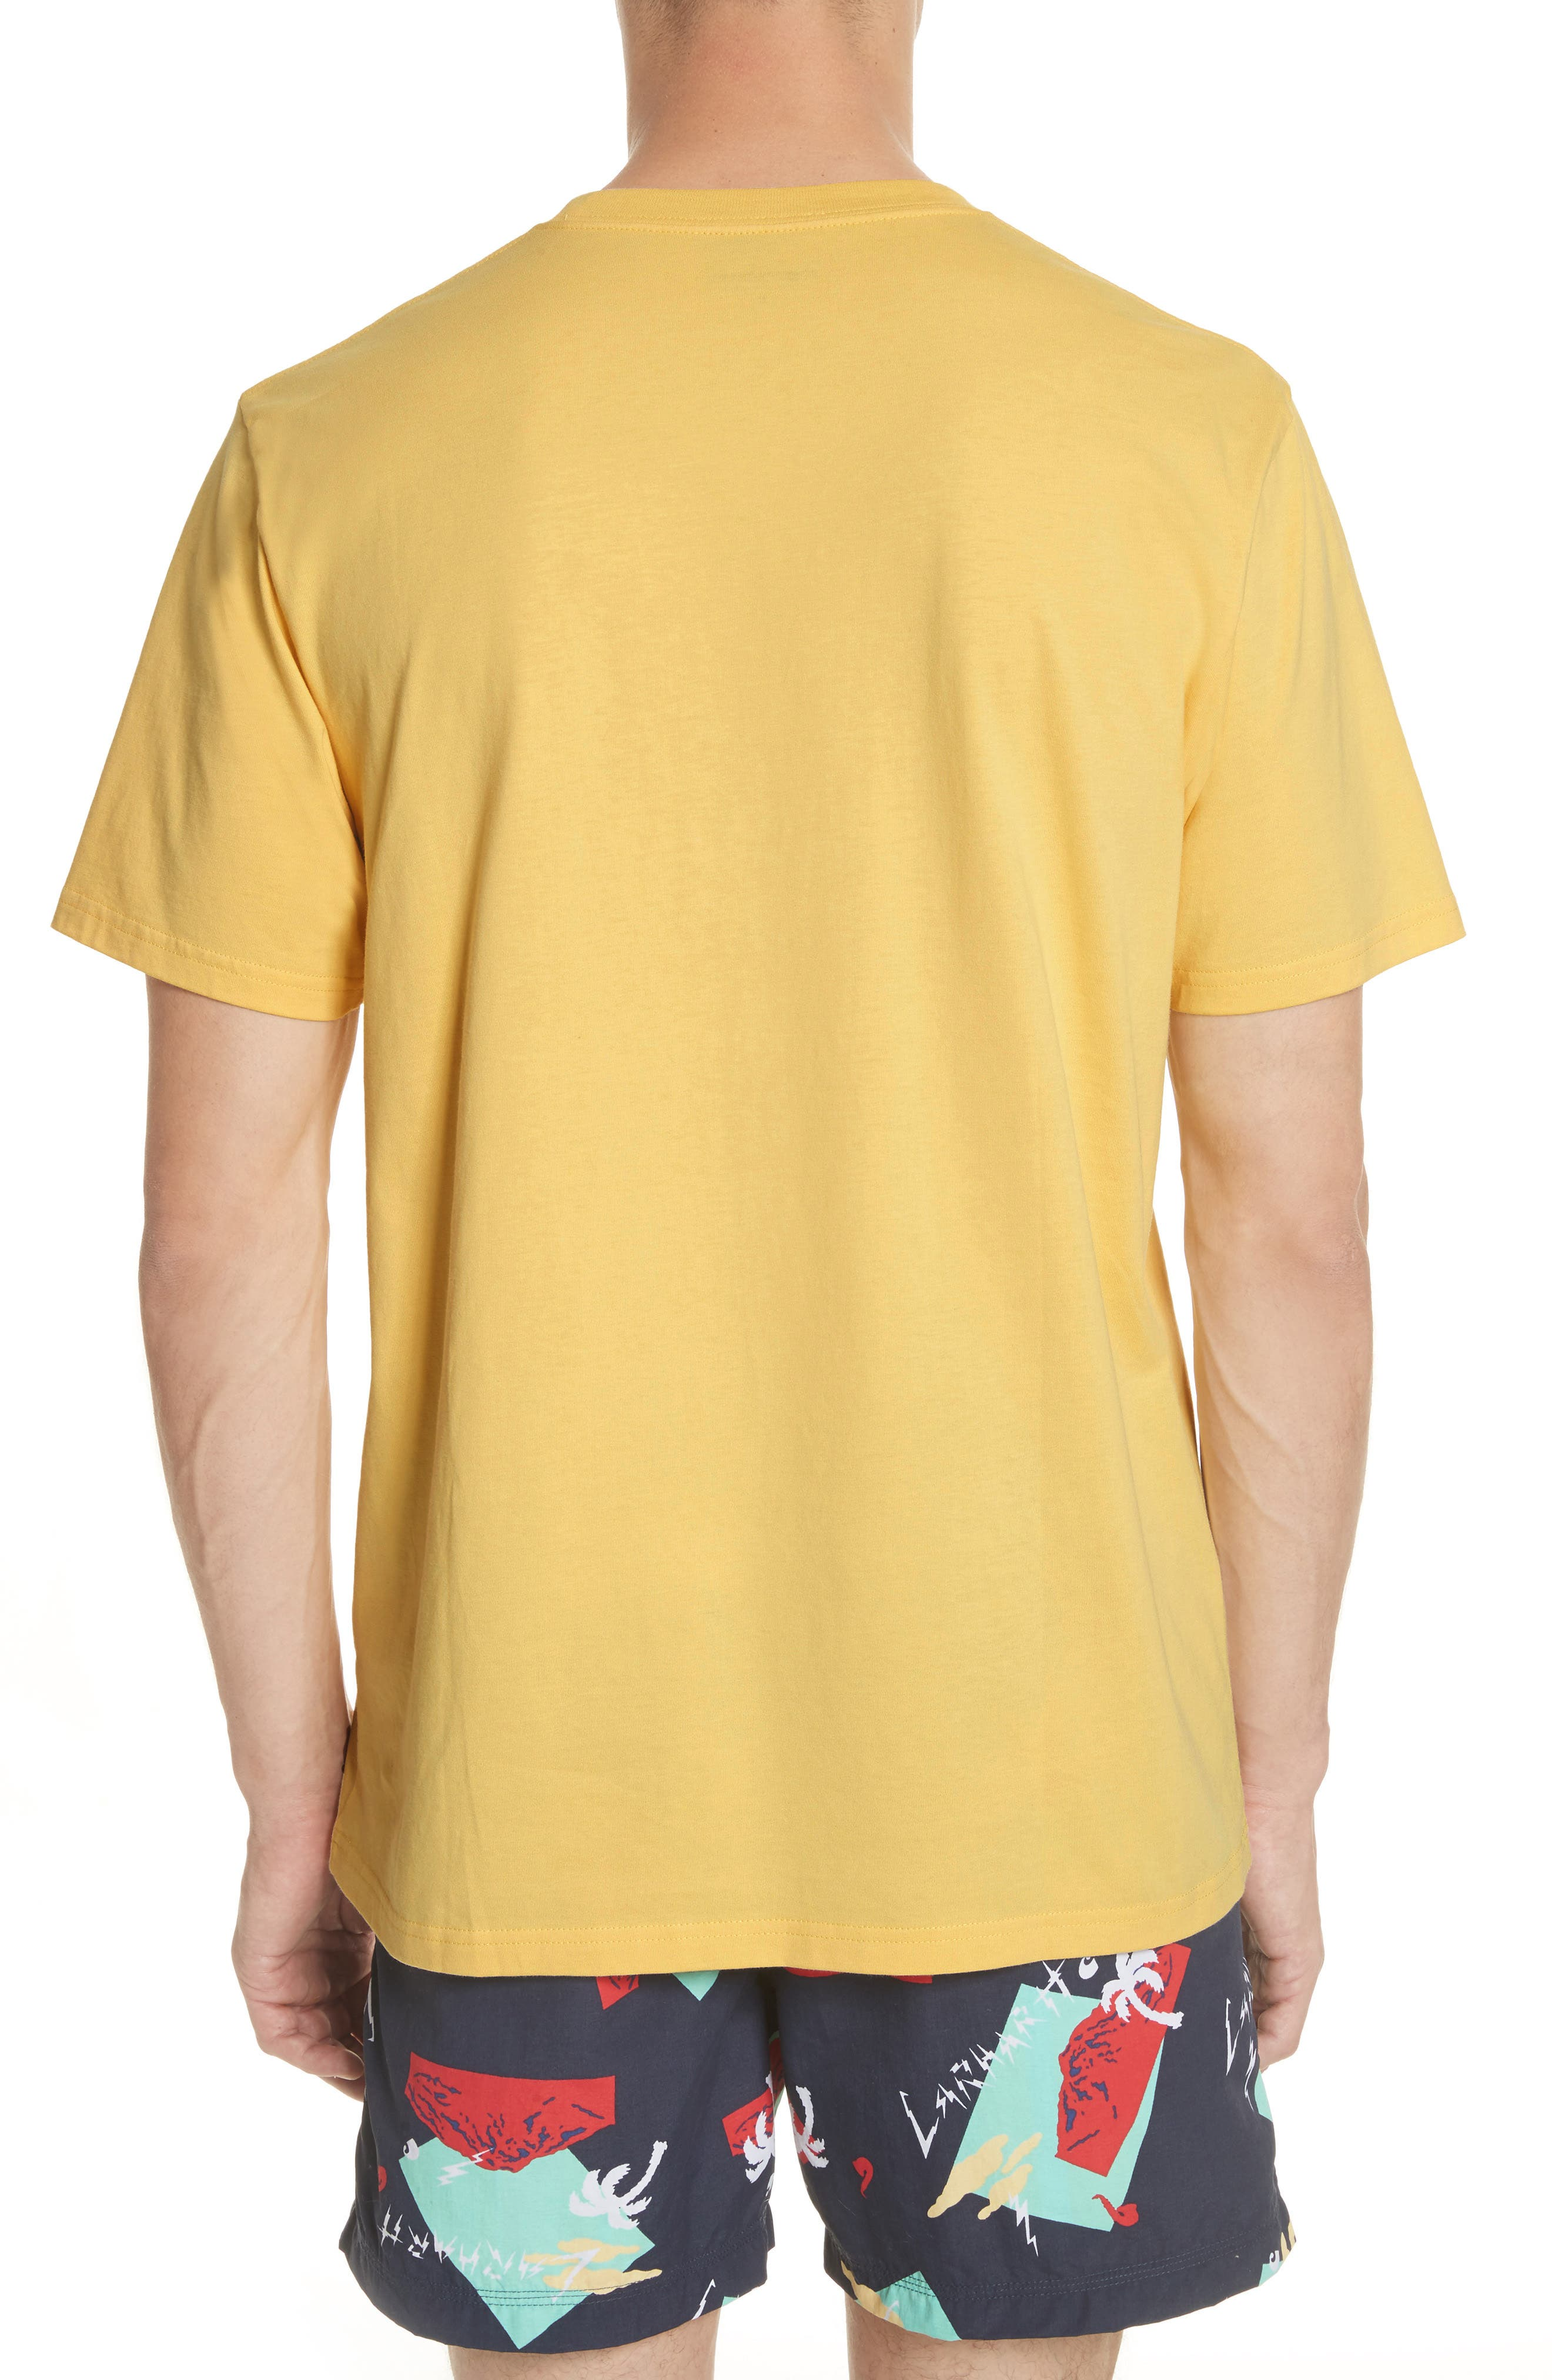 Anderson T-Shirt,                             Alternate thumbnail 2, color,                             750